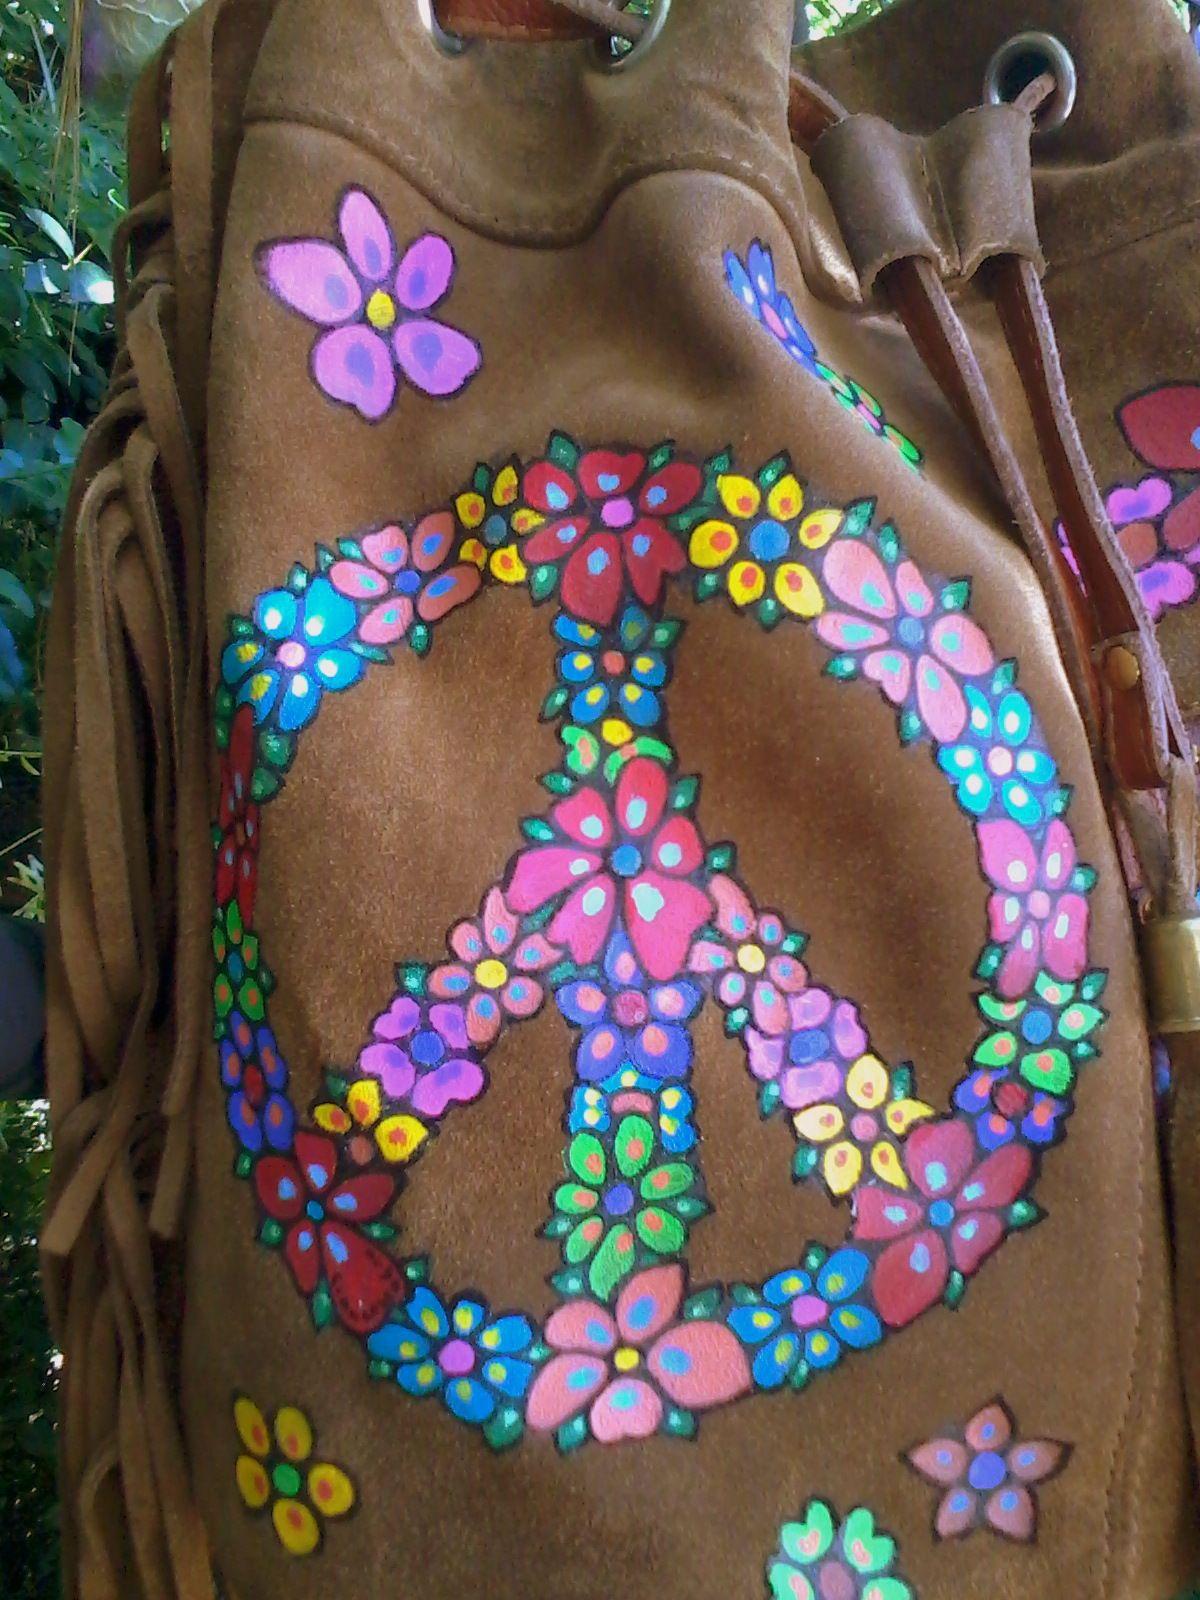 #FrancescaBoo #handpainted #bags #carteraspintadas #peace #paz #flores #flowers